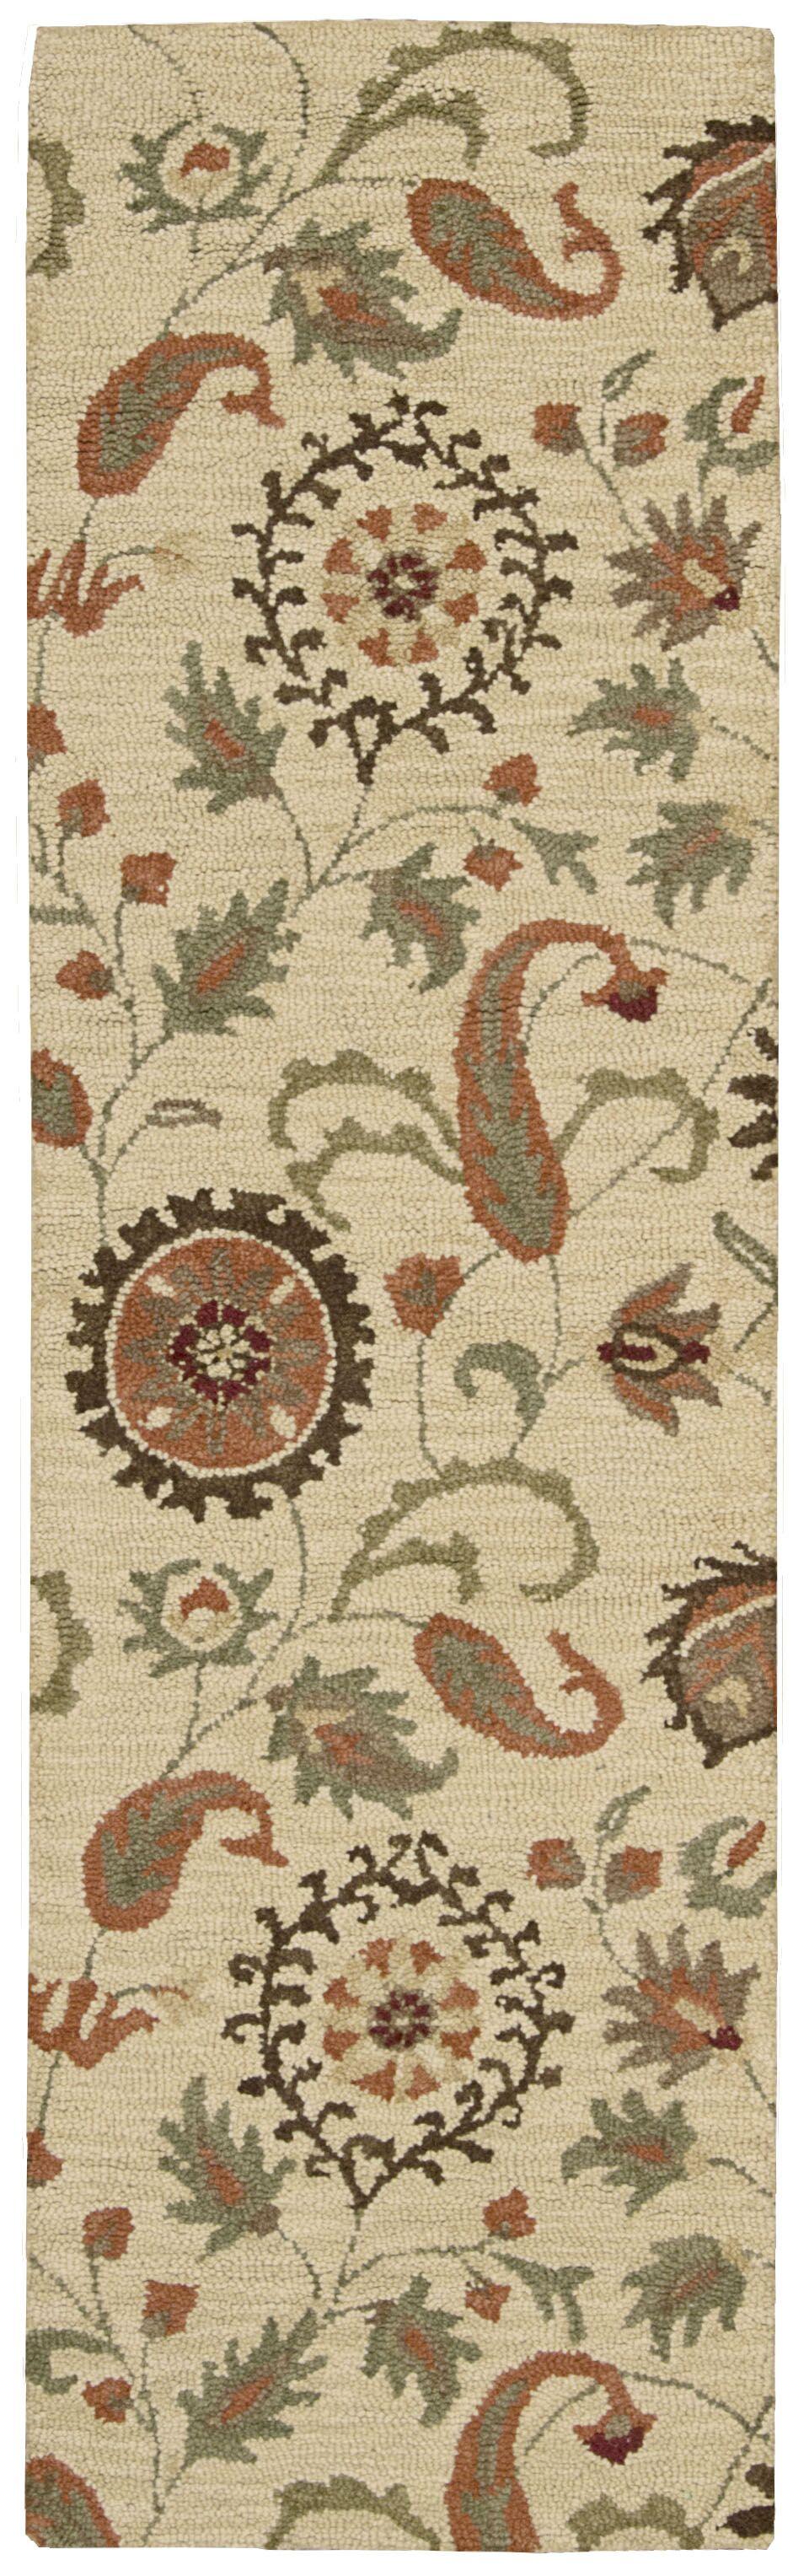 Langport Hand-Tufted Wool Beige Area Rug Rug Size: Runner 2'3